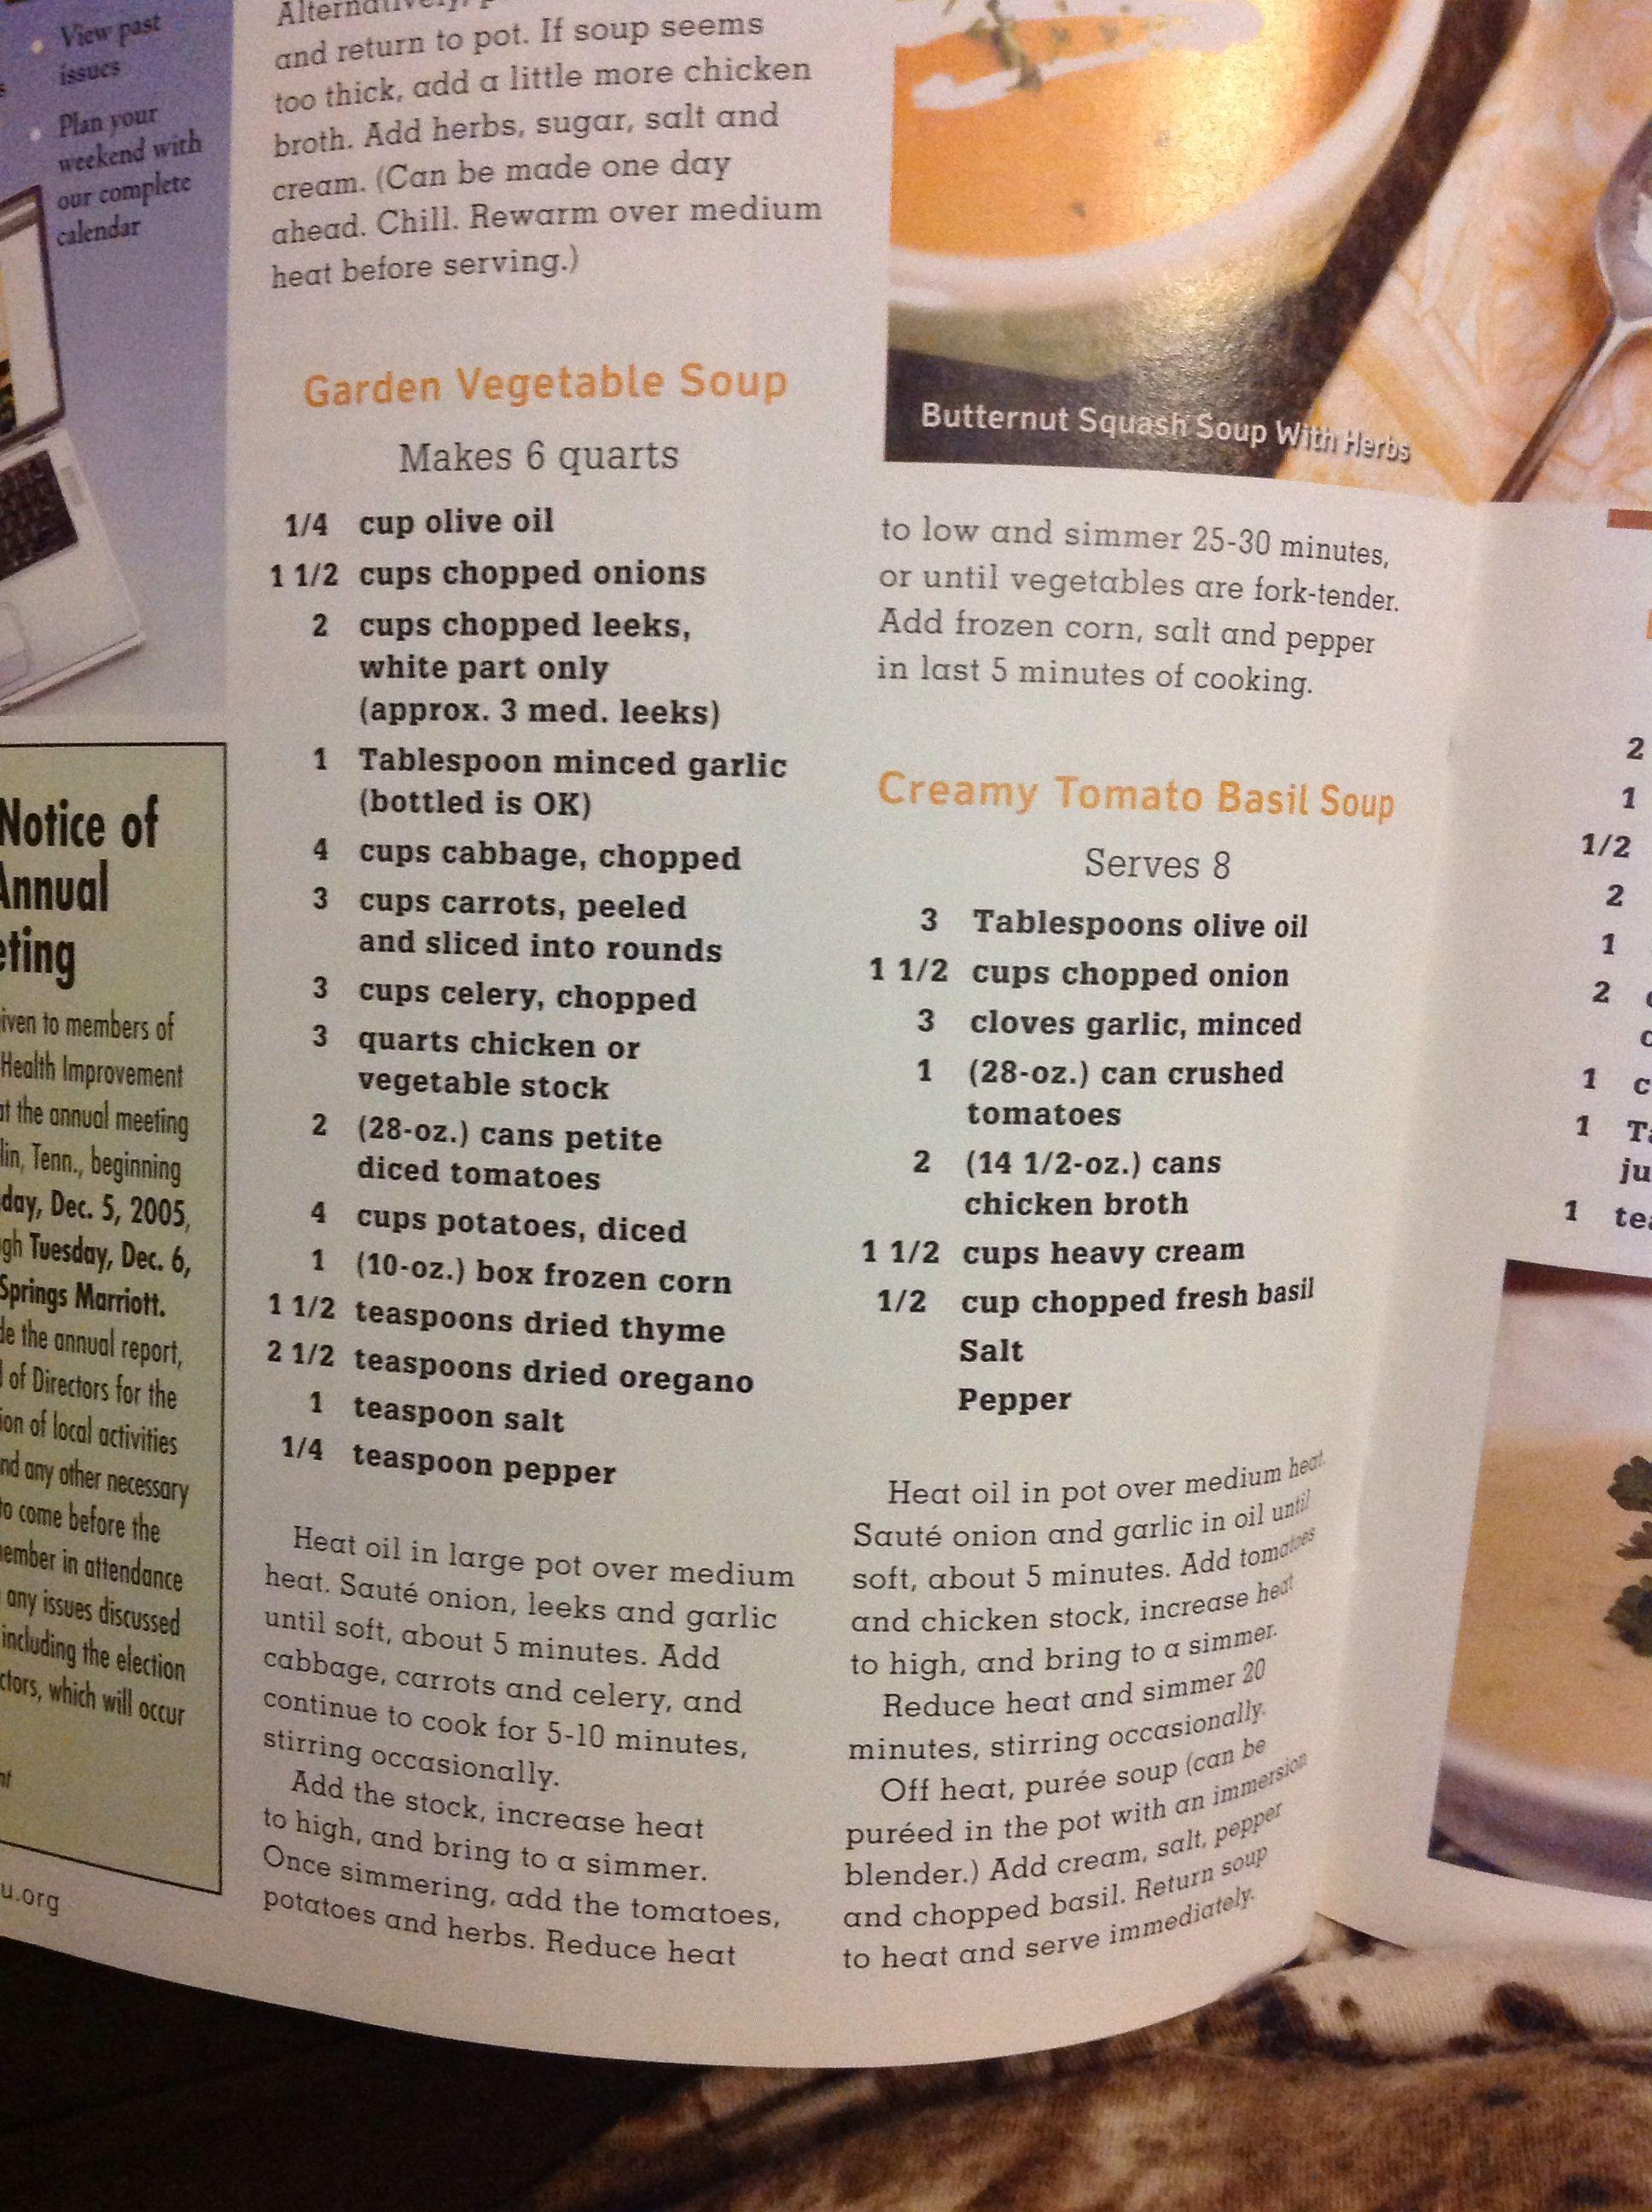 Garden vegetable and creamy tomato basil soups